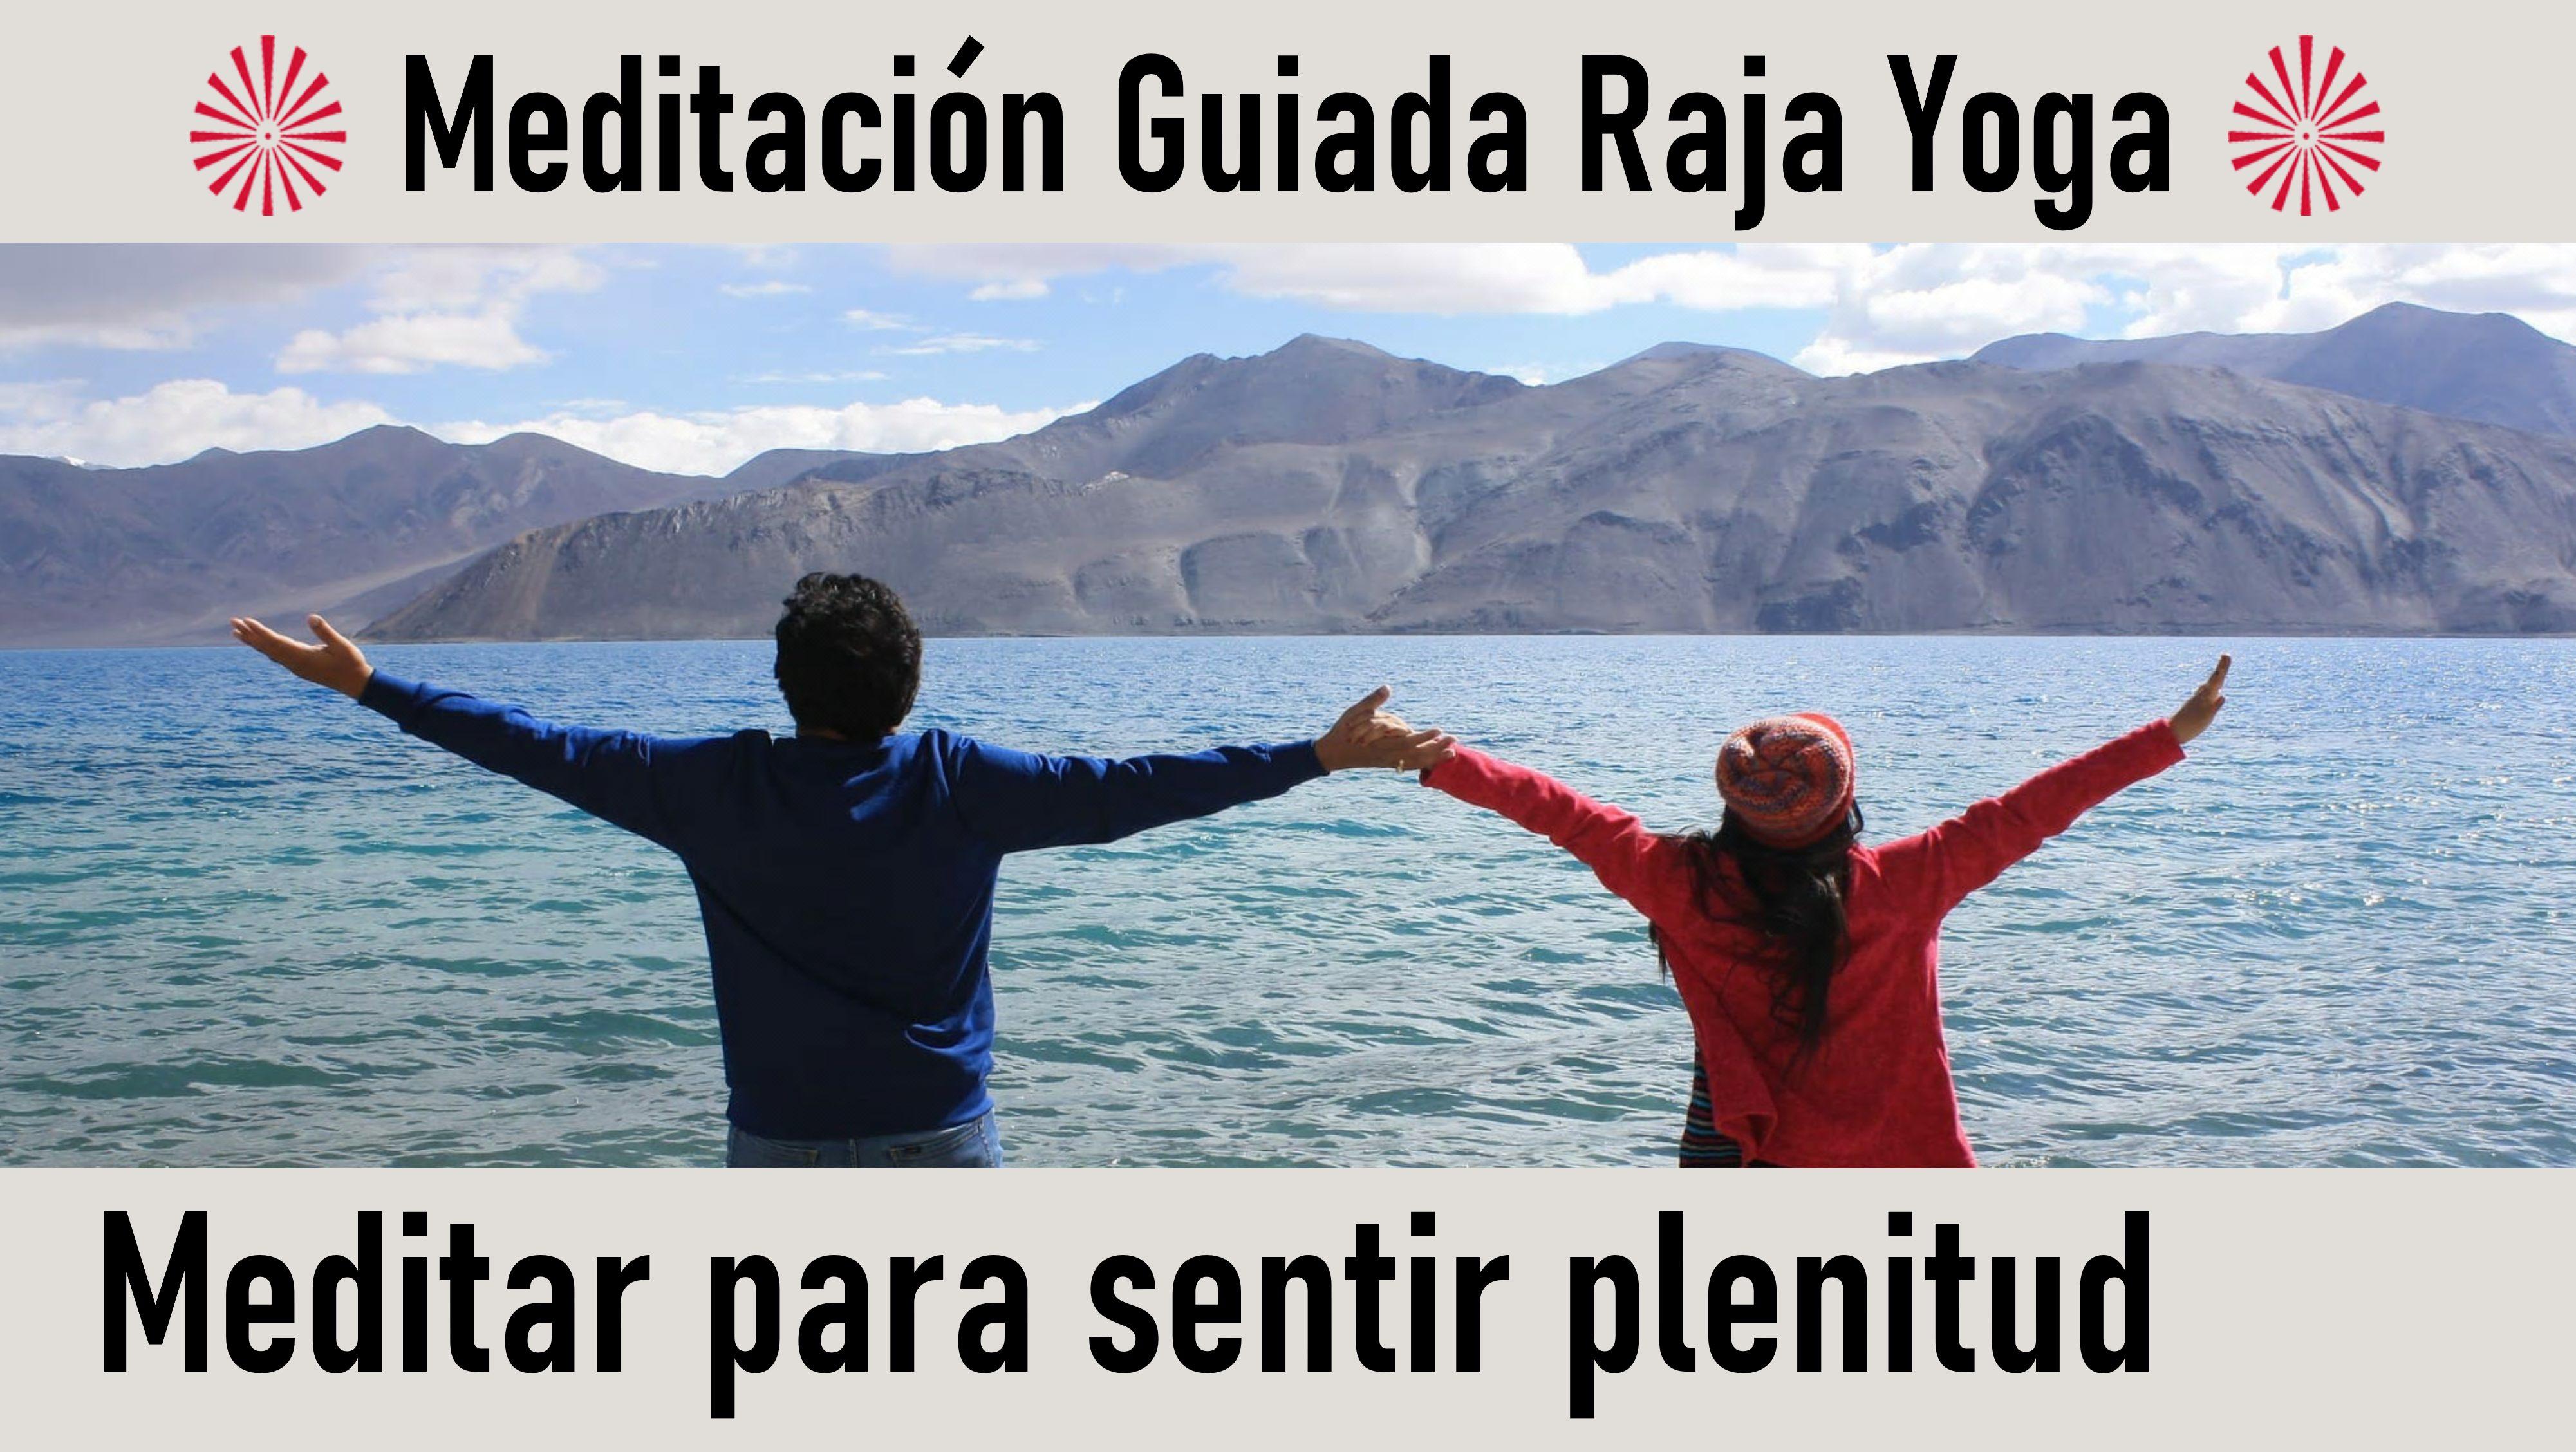 Meditación Raja Yoga: Meditar para Sentir Plenitud (3 Junio 2020) On-line desde SEvilla